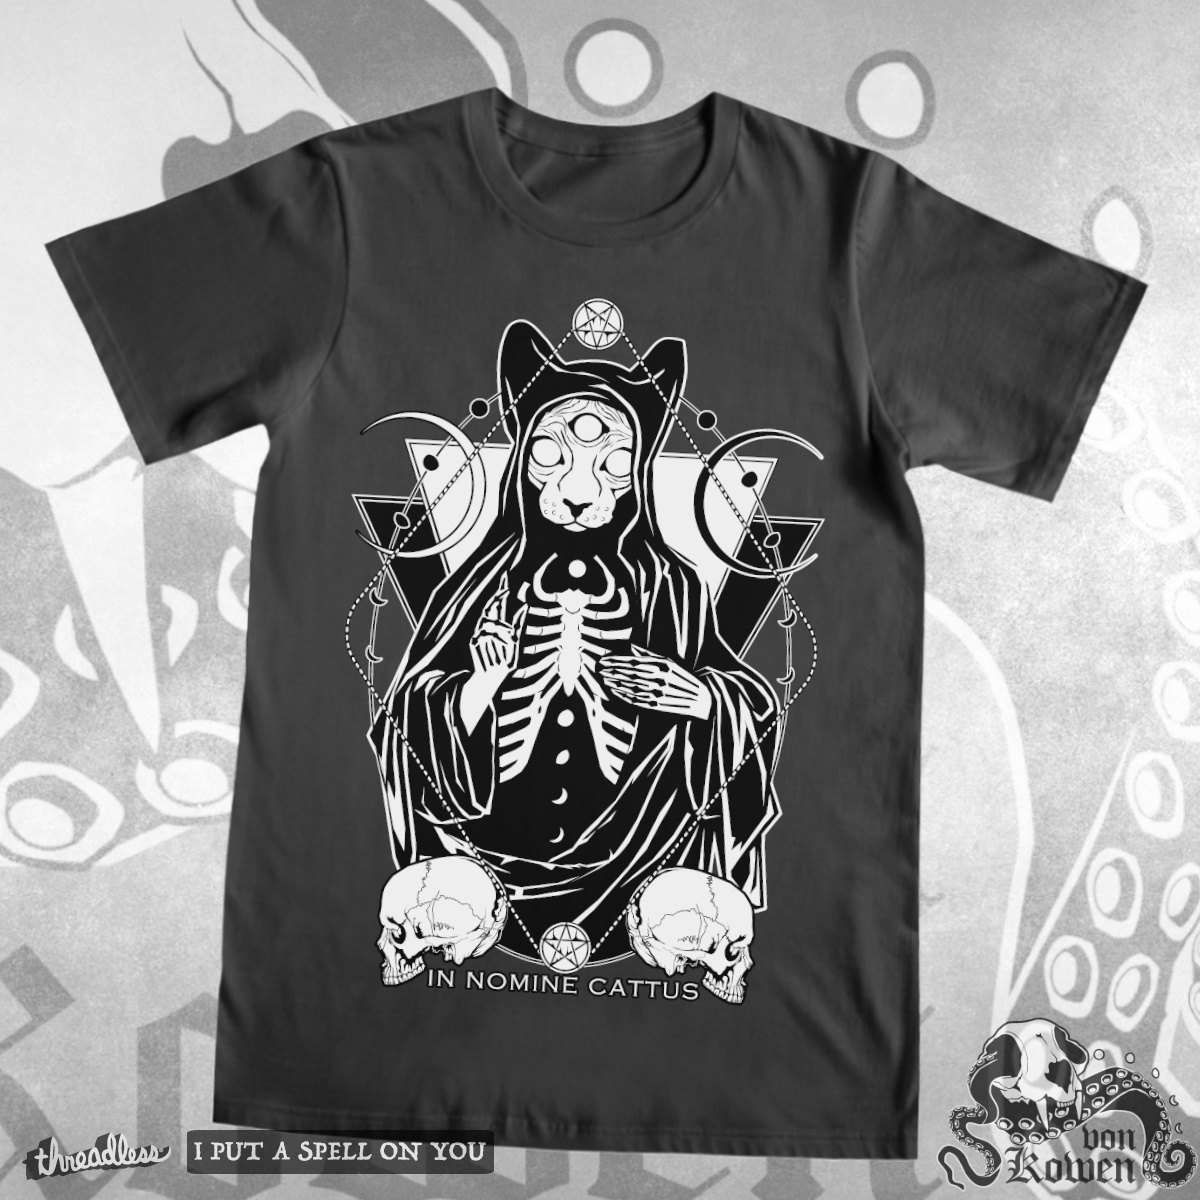 Cat Priest, a cool t-shirt design